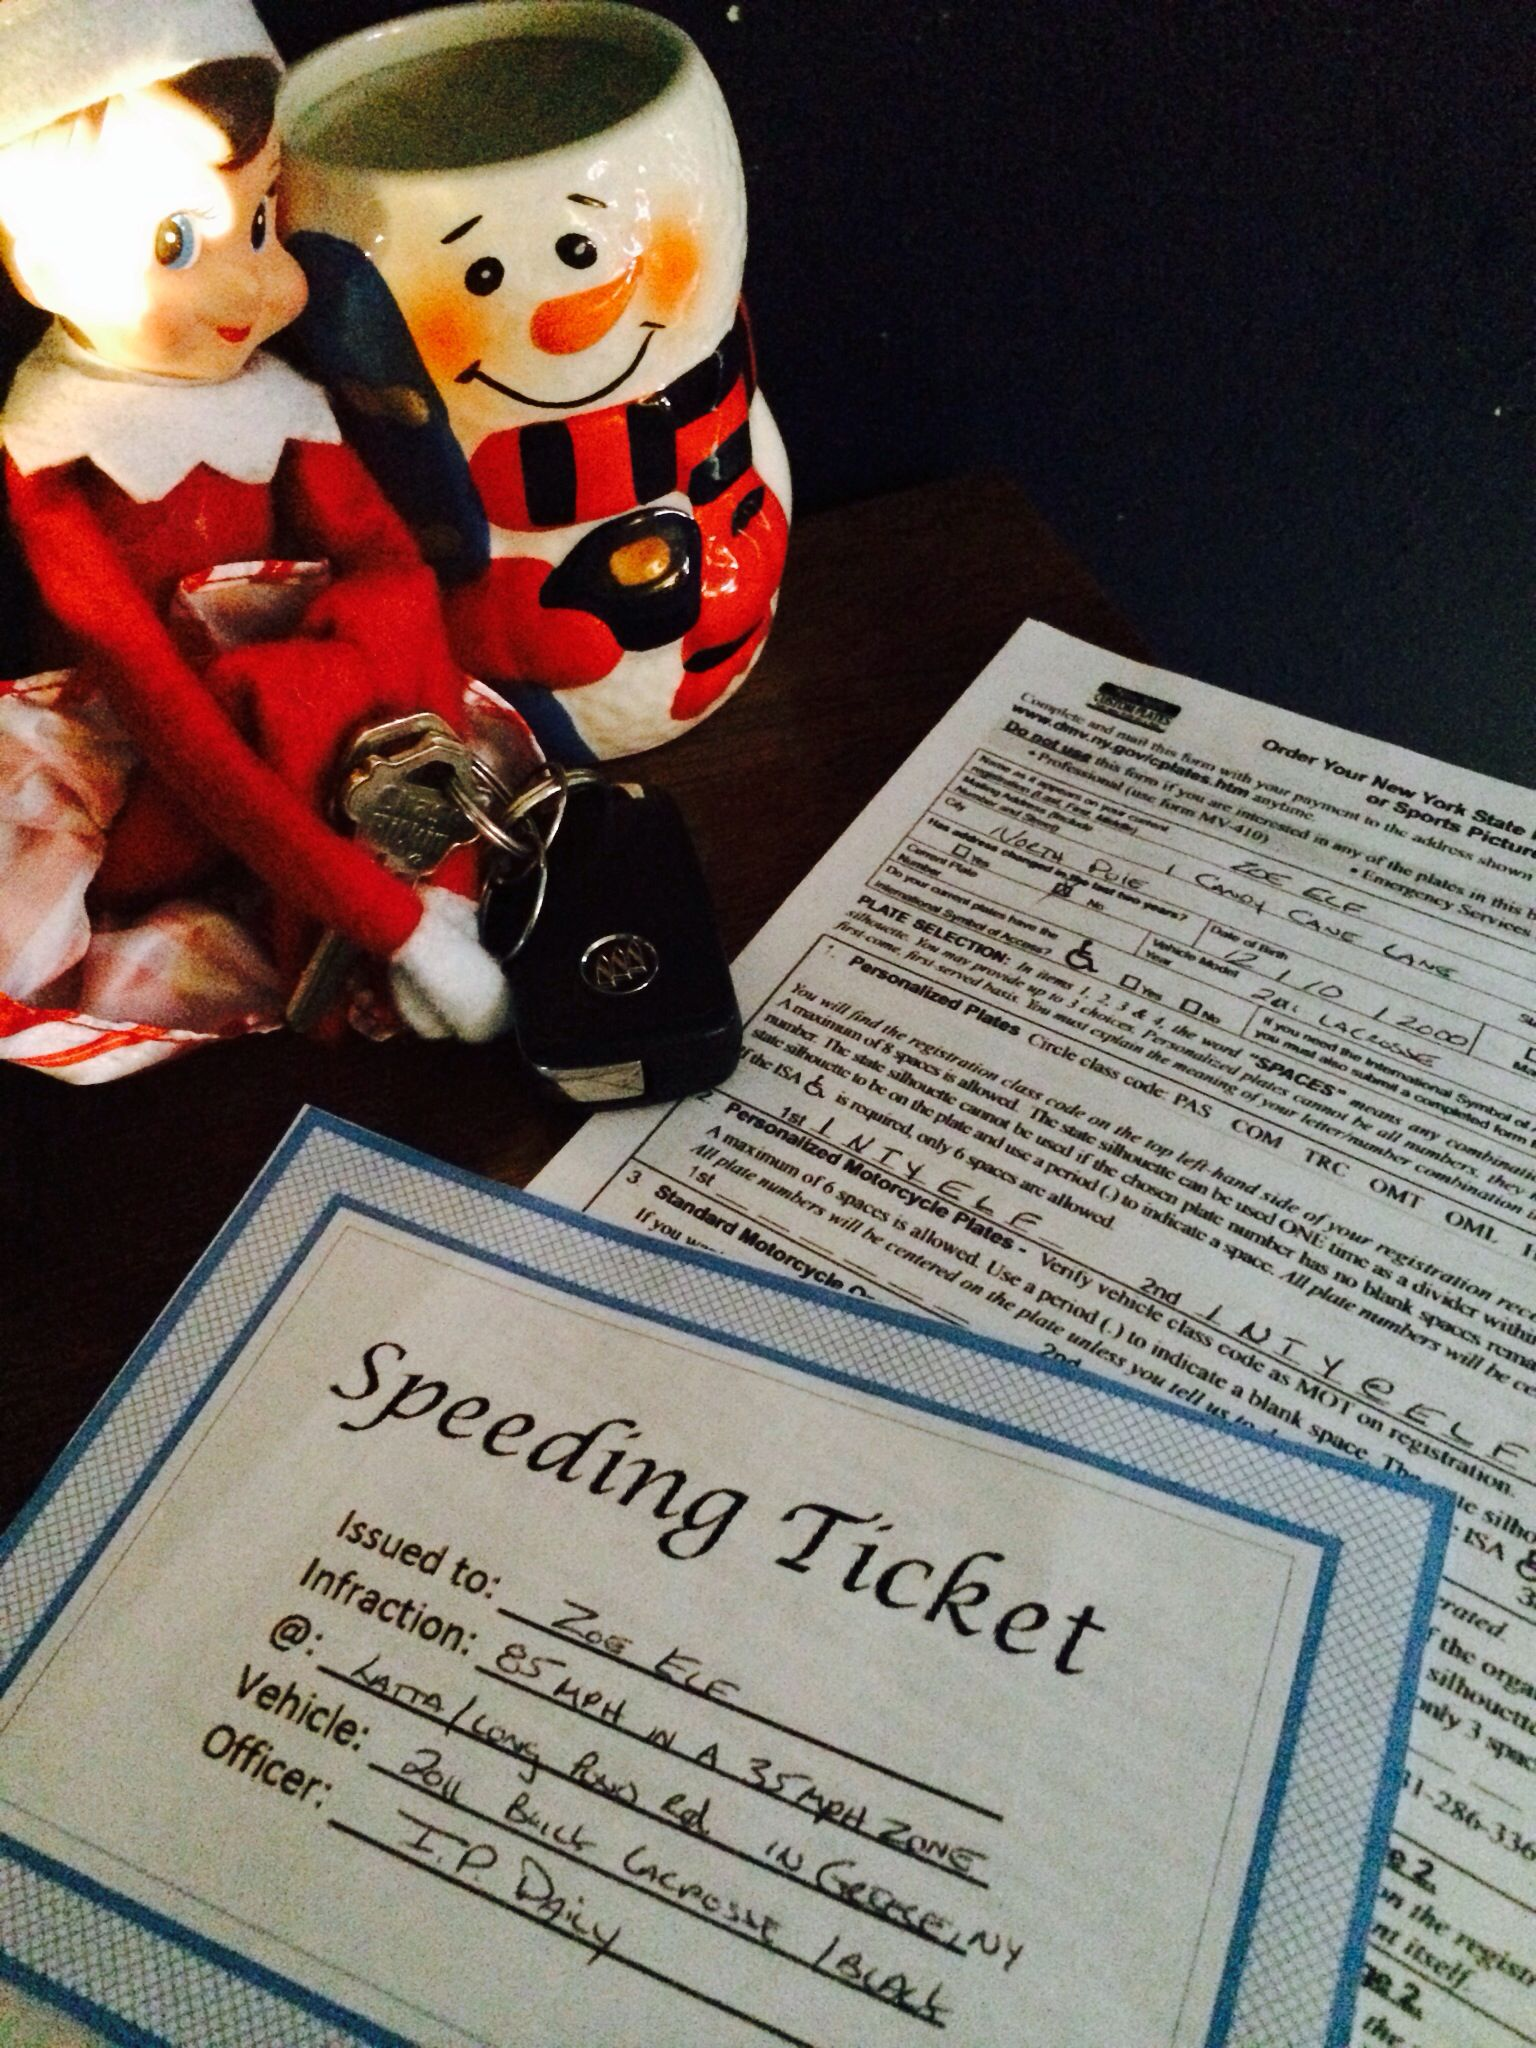 Received New York State Speeding Ticket In 2020 New York State Speeding Tickets York